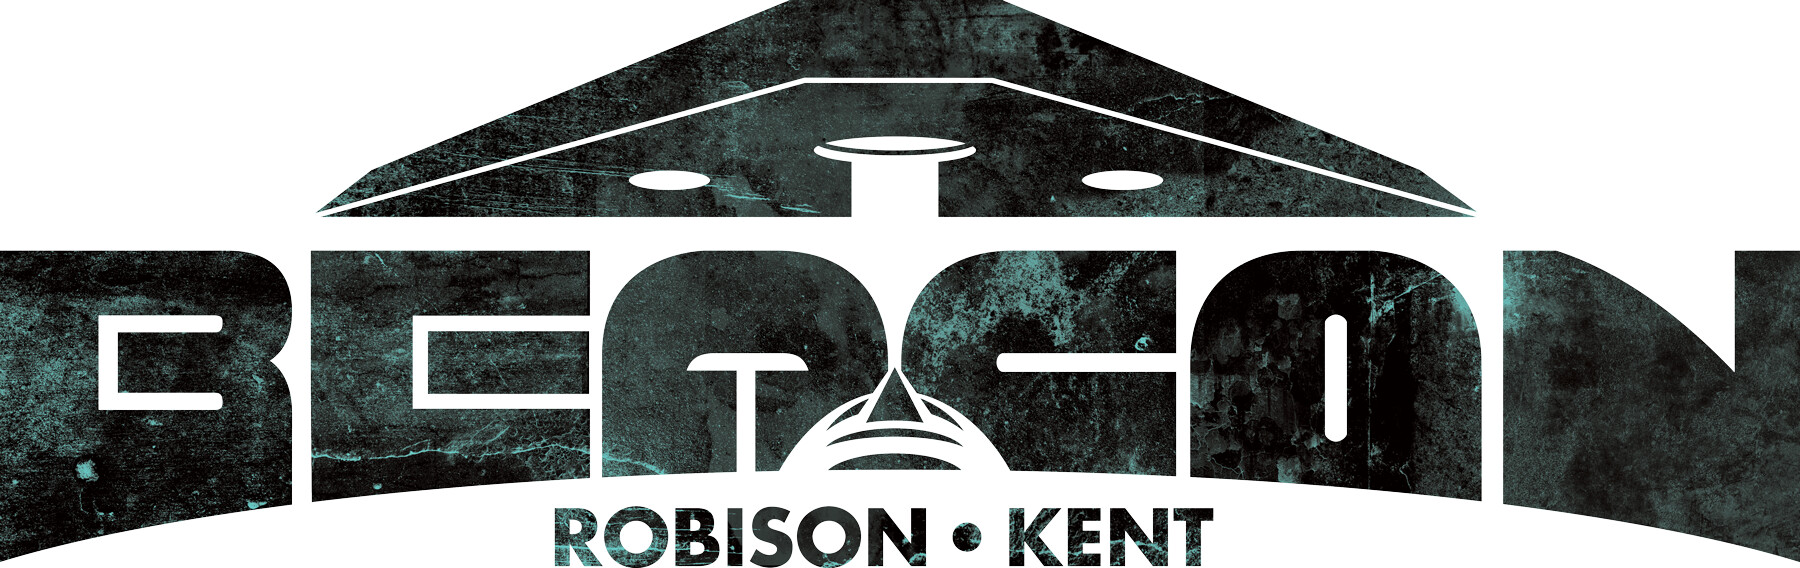 Charles kent beacon logo final forprint